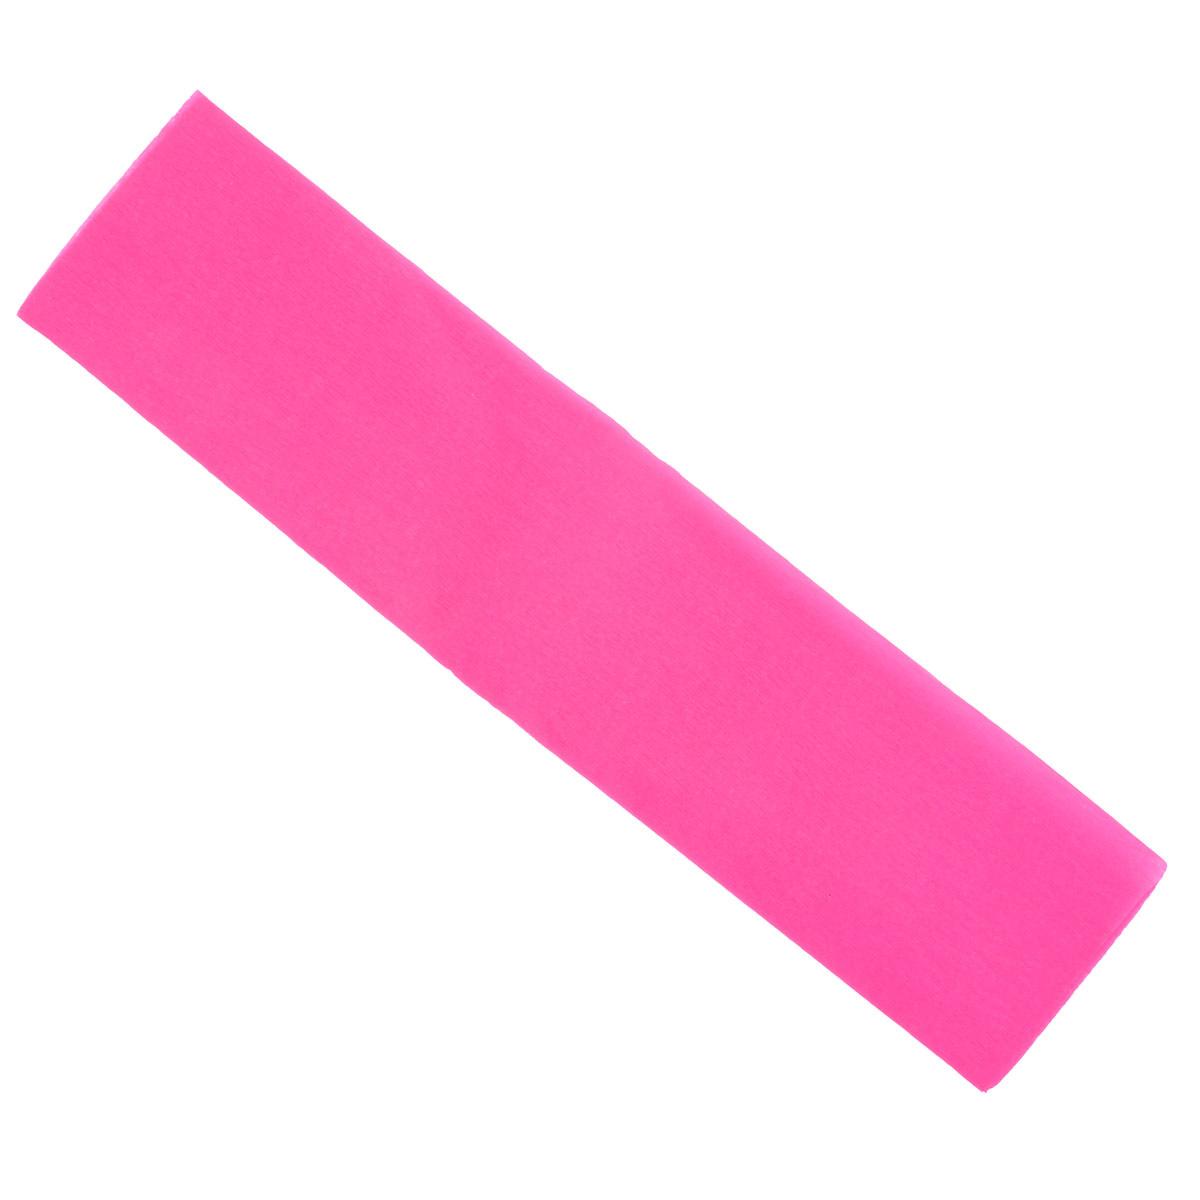 "Крепированная бумага ""Hatber"", флюоресцентная, цвет: розовый, 5 см х 25 см  #1"